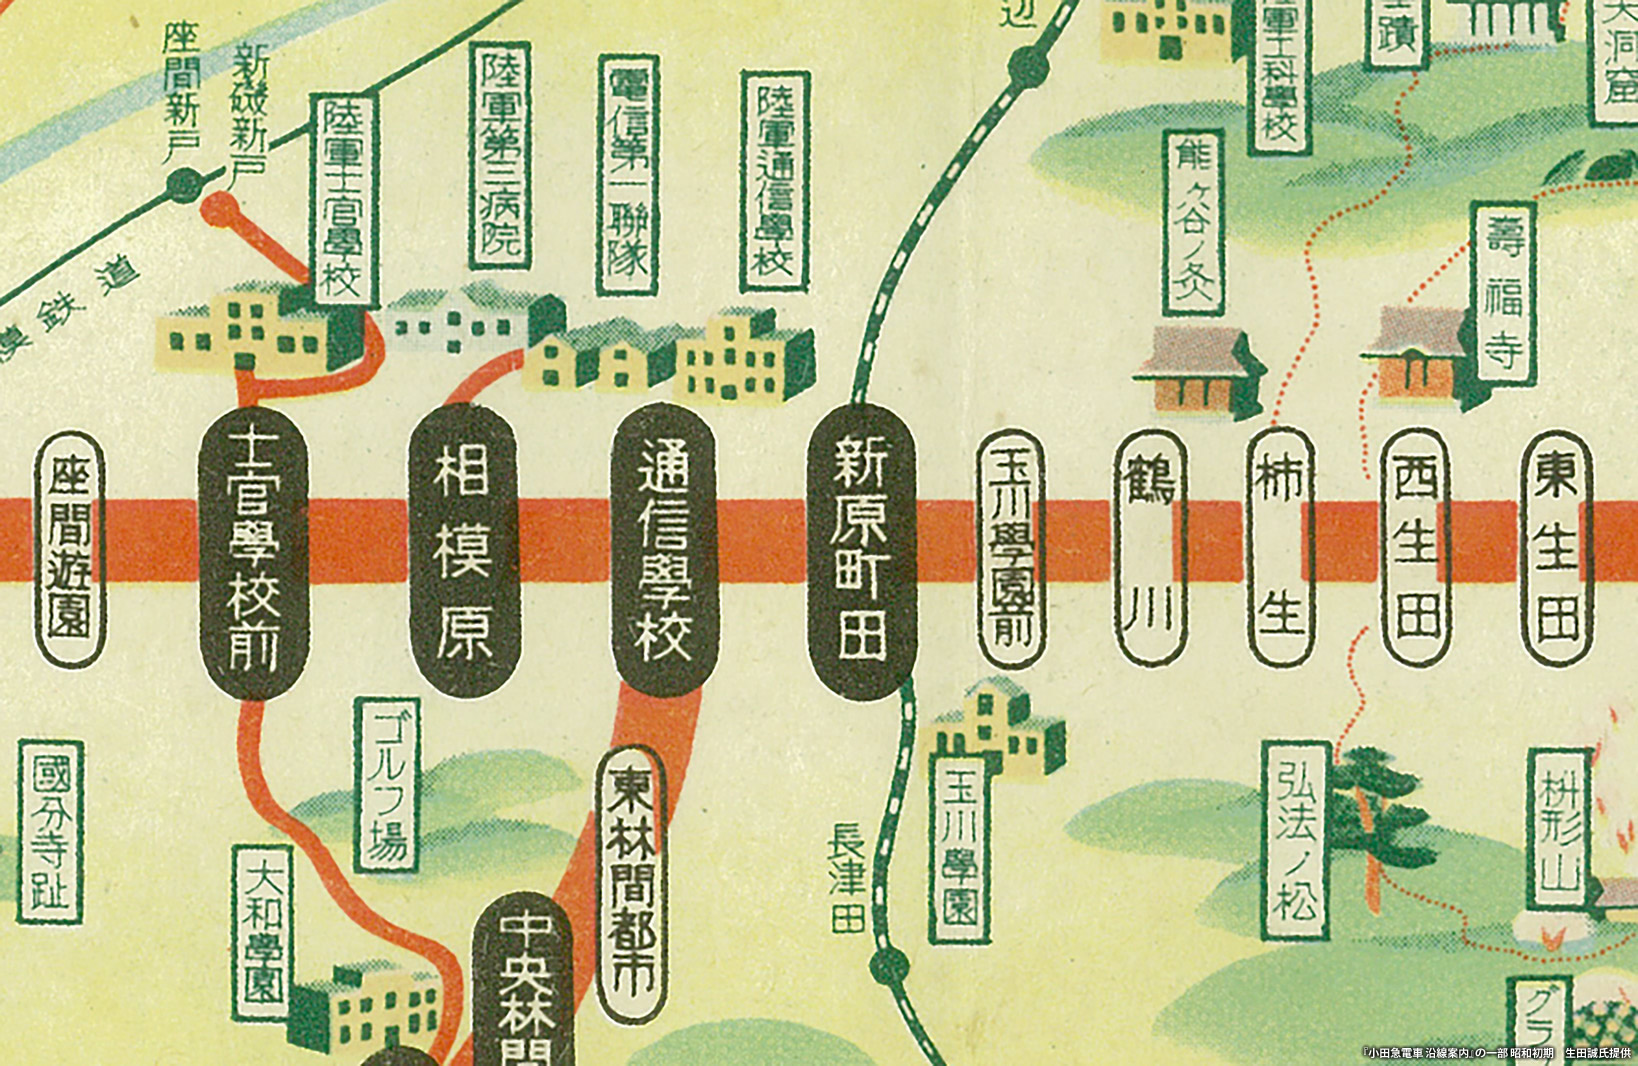 https://smtrc.jp/town-archives/city/machida/images/original/05-04-01.jpg